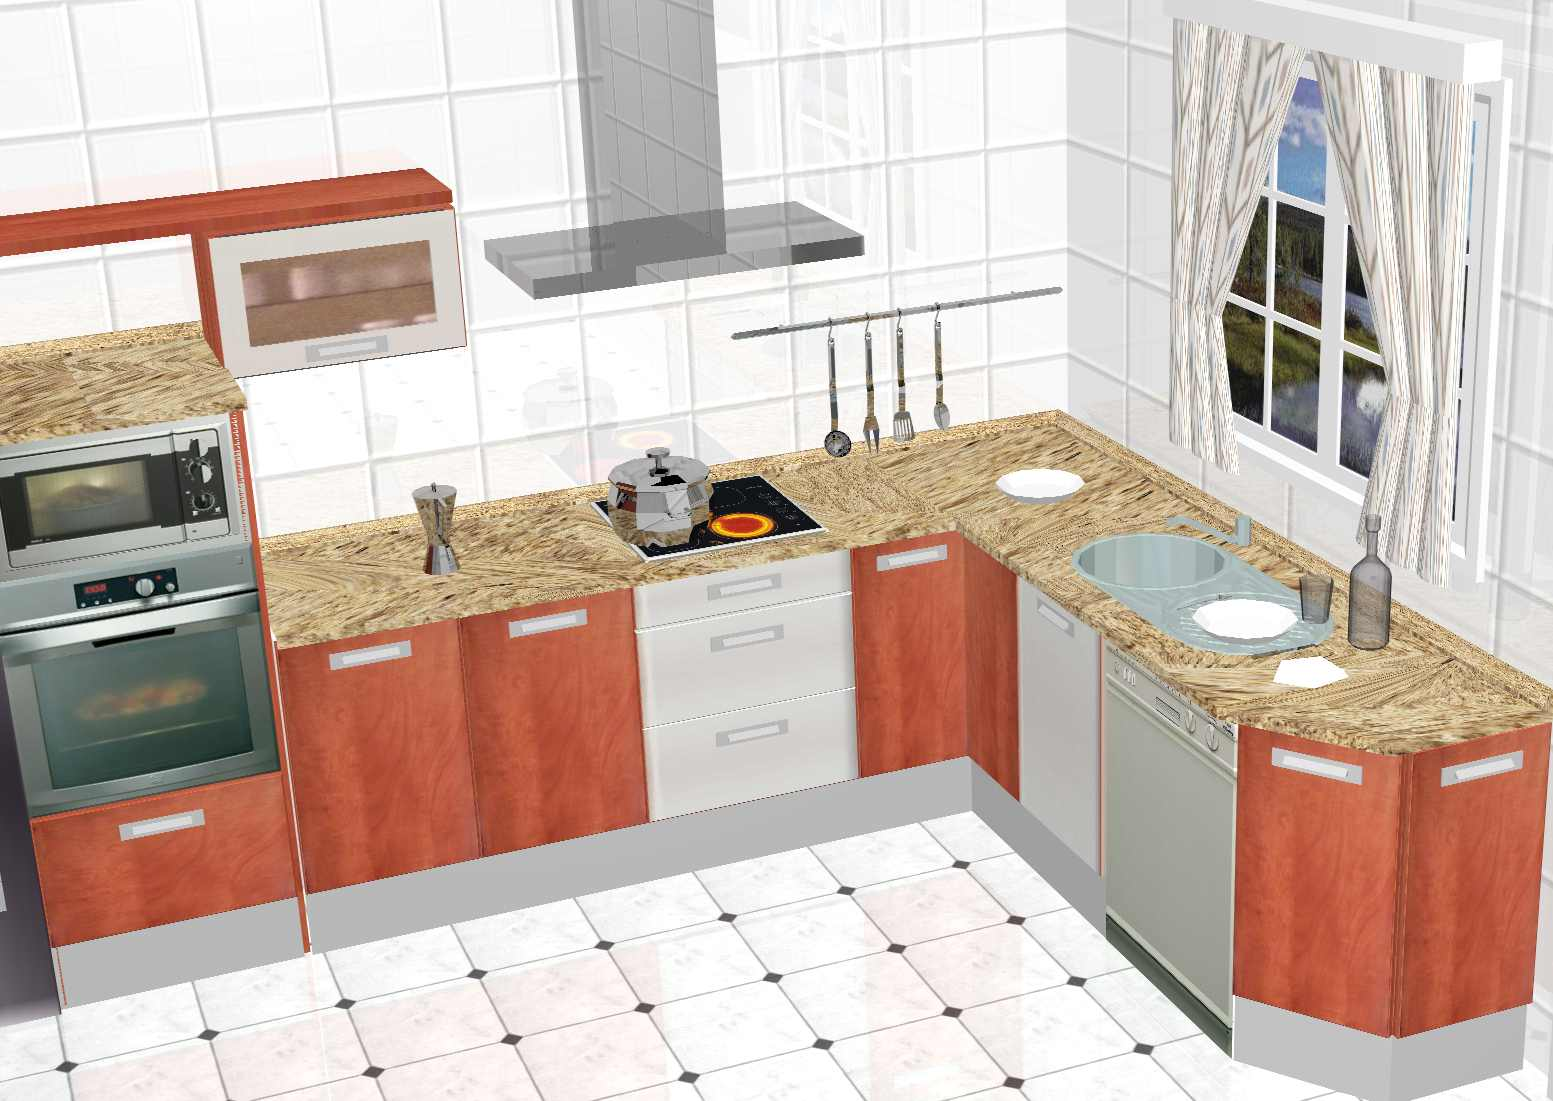 Cualidades principales del dise o de cocinas 3d - Diseno para cocinas modernas ...